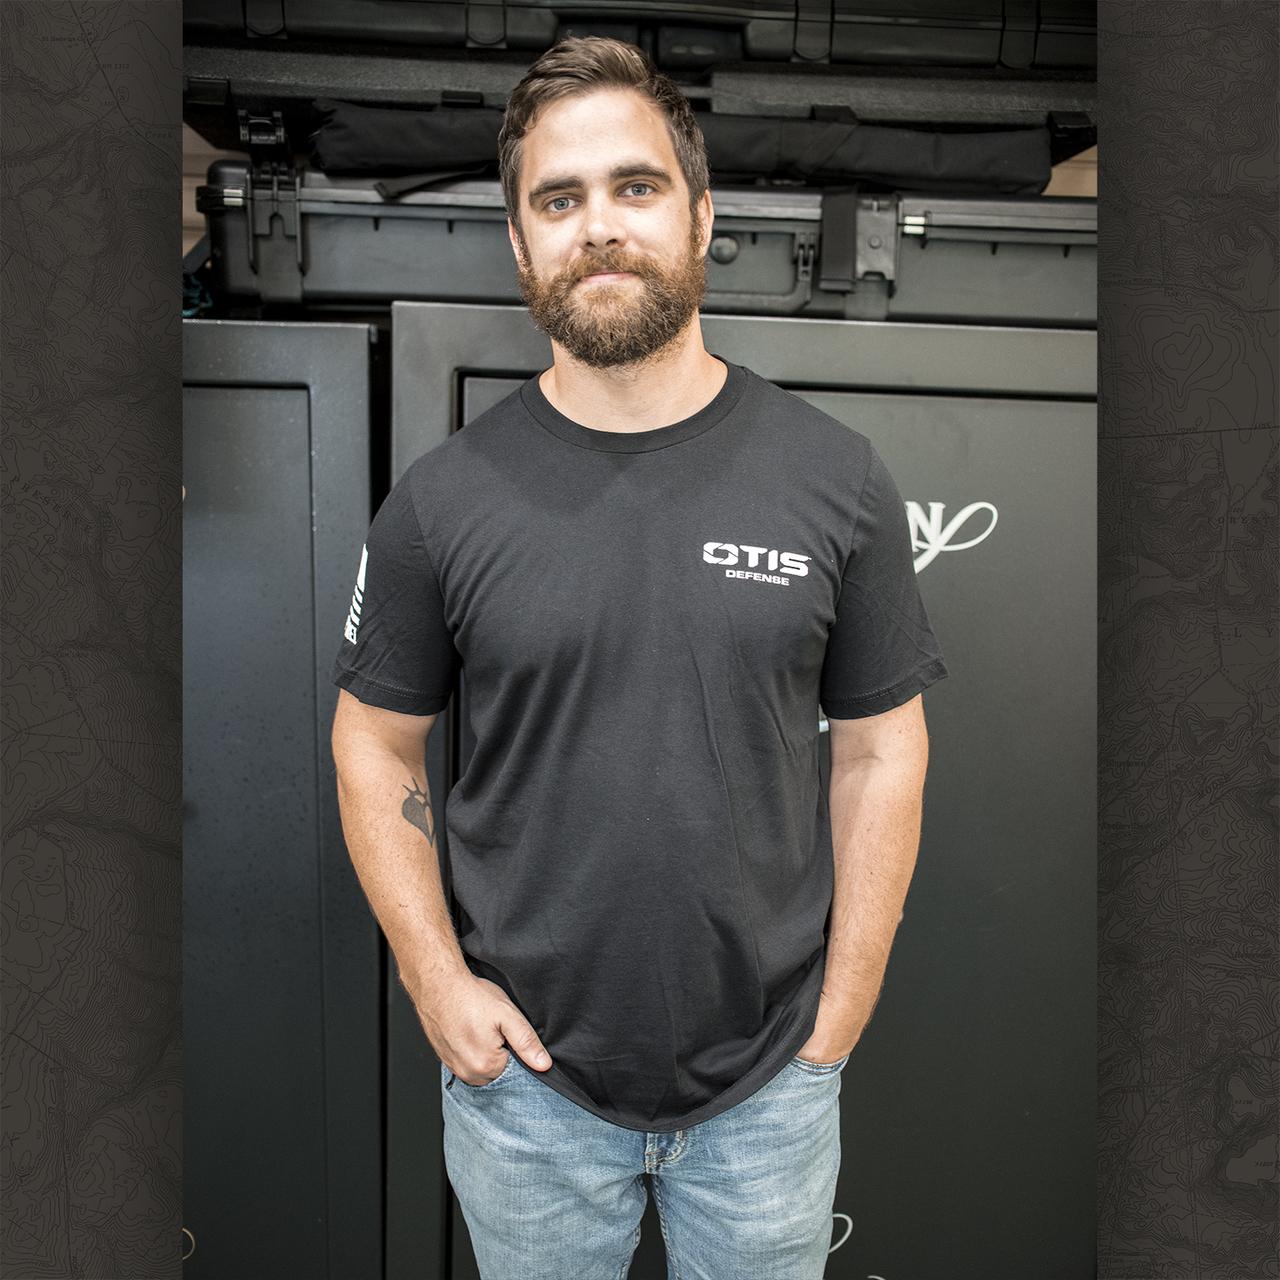 Otis Nine Line Small Arms T-Shirt